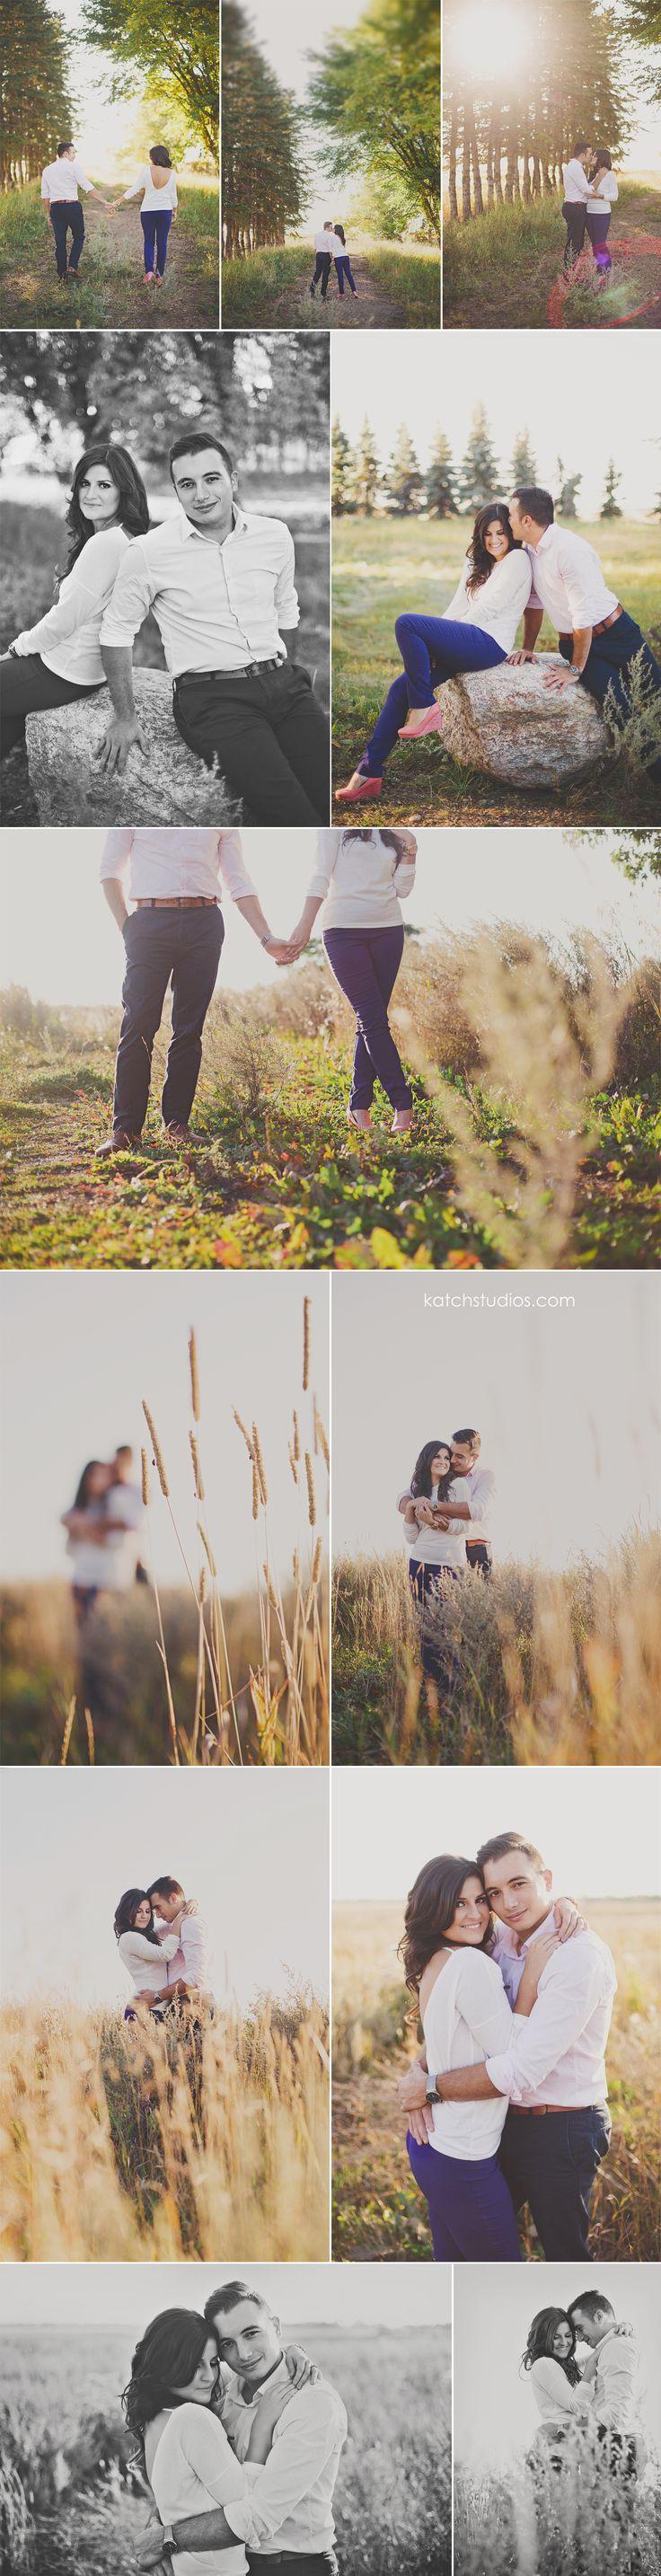 Cassandra & Benito: Engaged | Edmonton wedding photographer